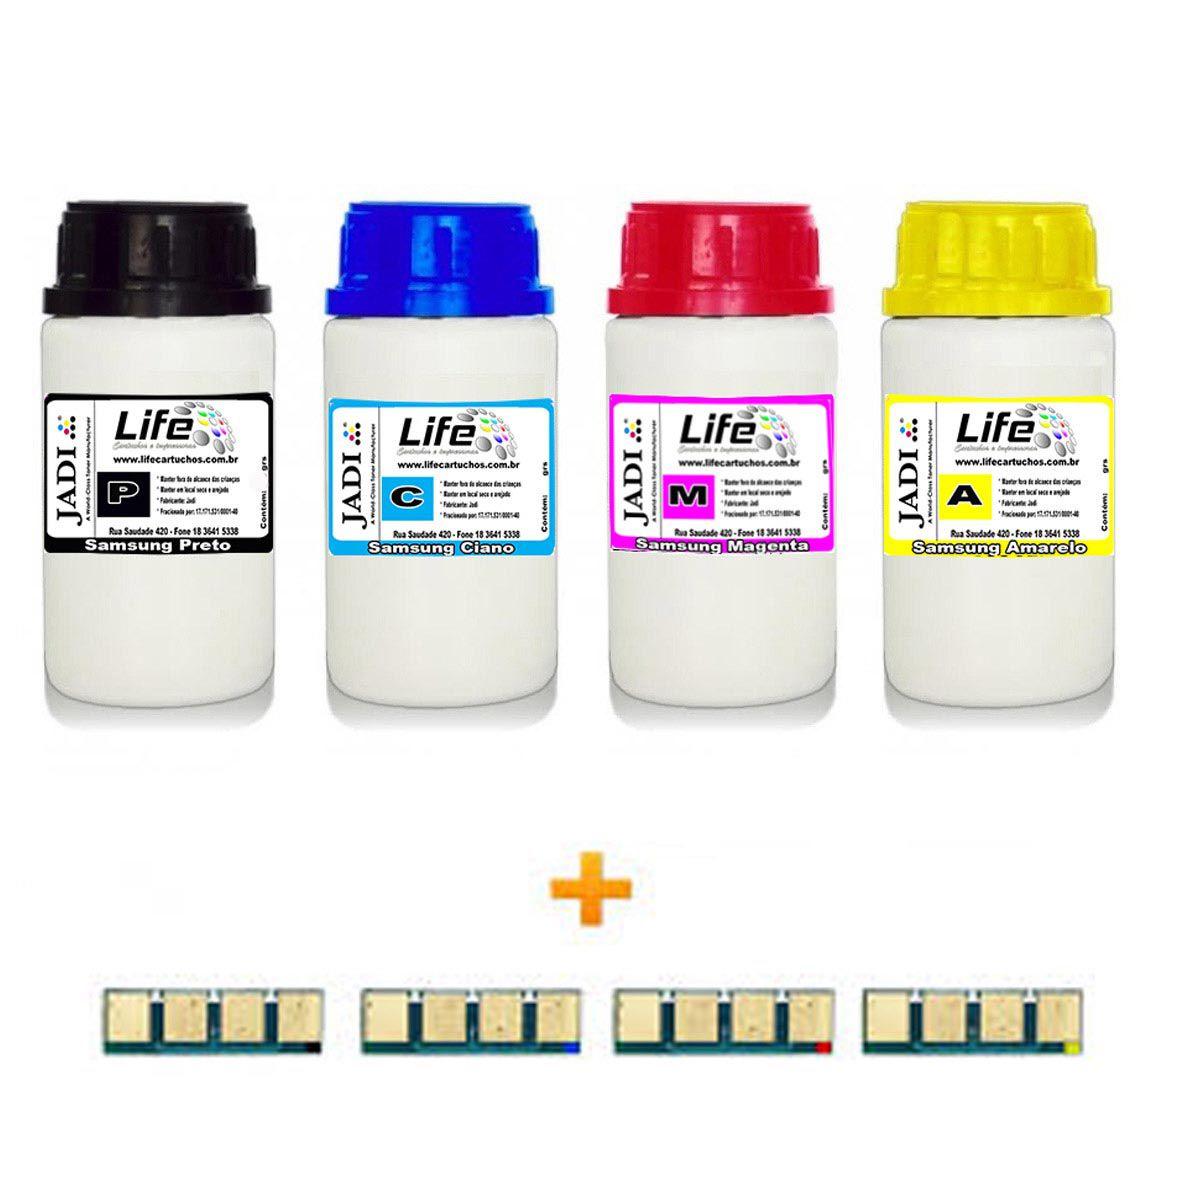 Kit 4 Refil Pó Toner + 4 Chip Samsung K406 C406 M406 Y406 - CLP365 C460W C460FW C410W